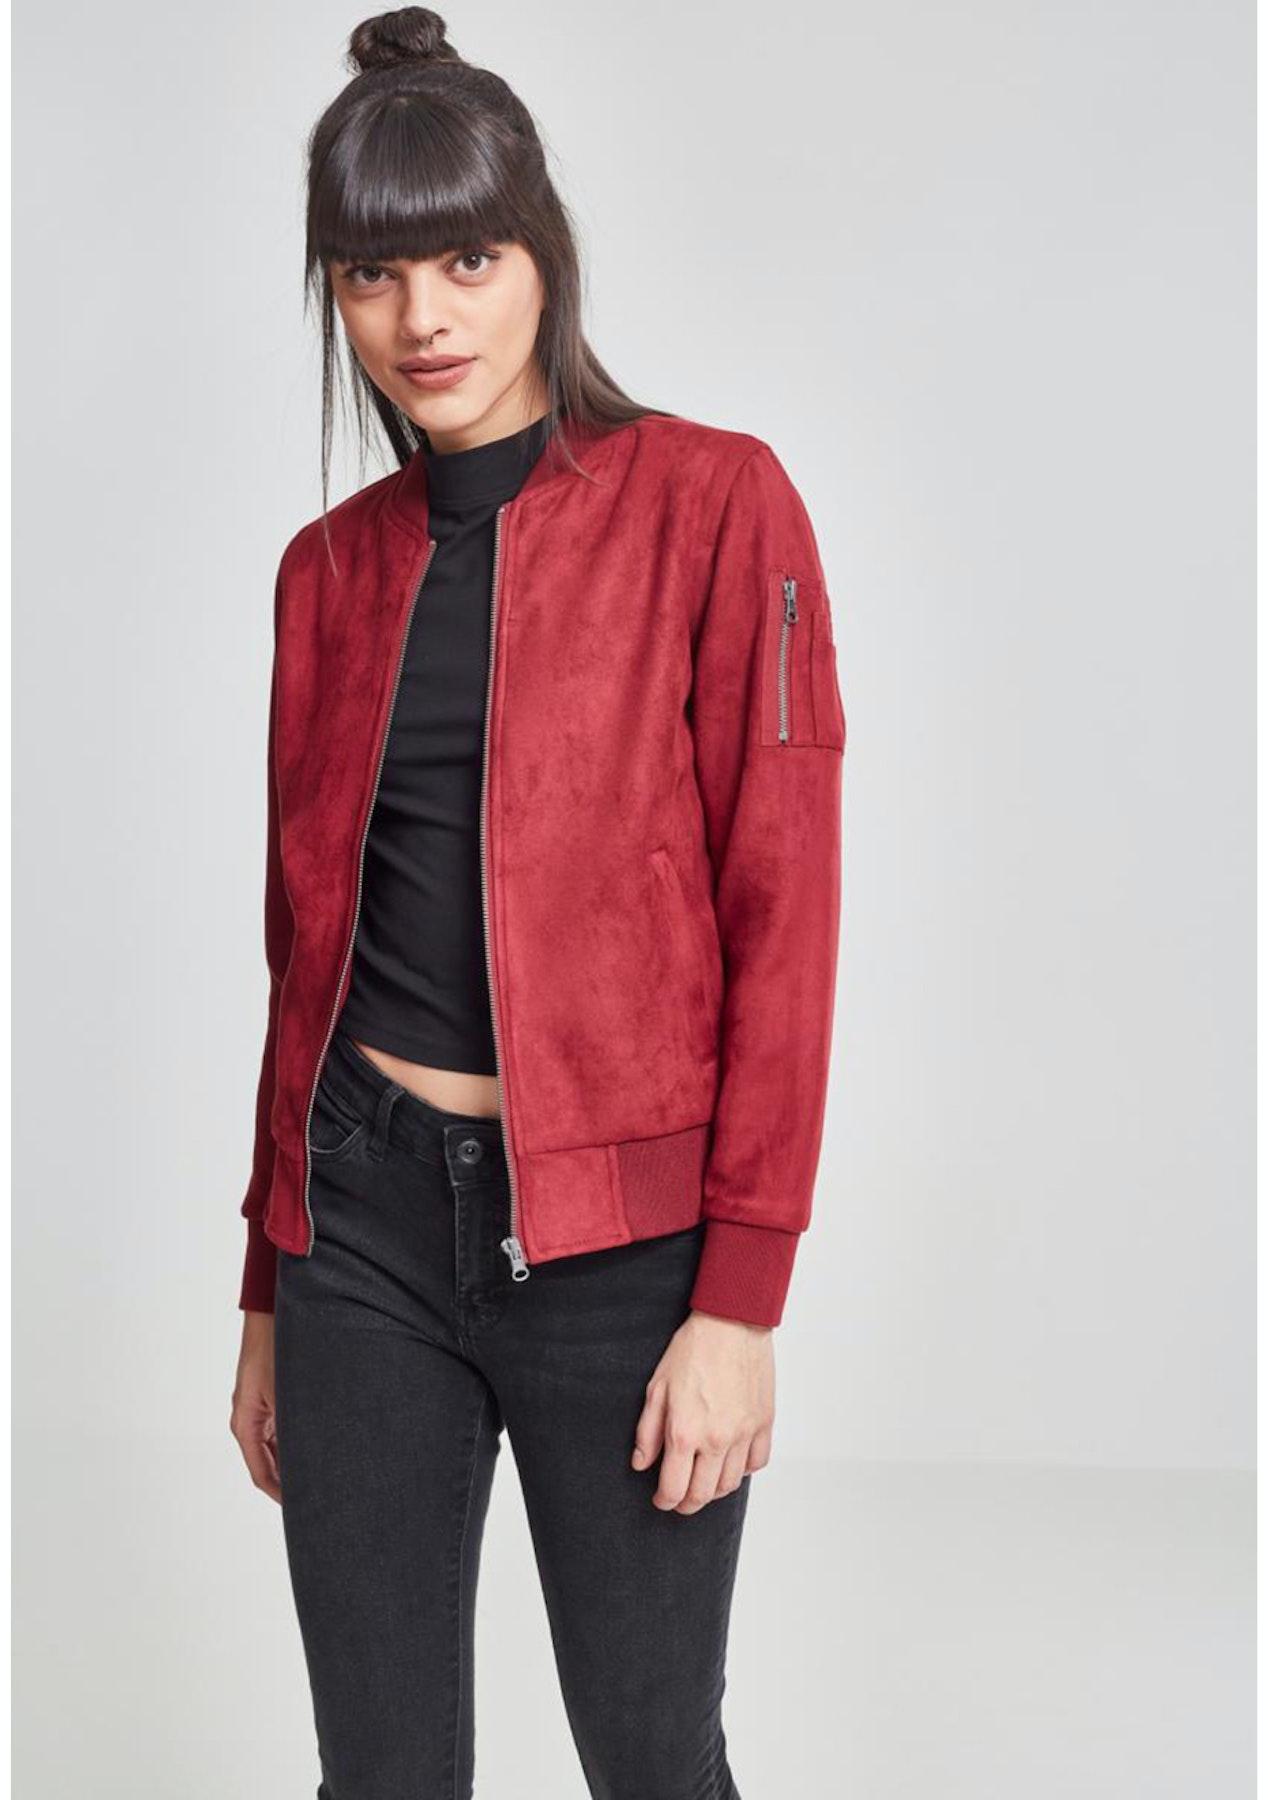 27721021920b Urban Classics - Womens Imitation Suede Bomber Jacket - Burgundy - The  Streetwear Edit - Onceit